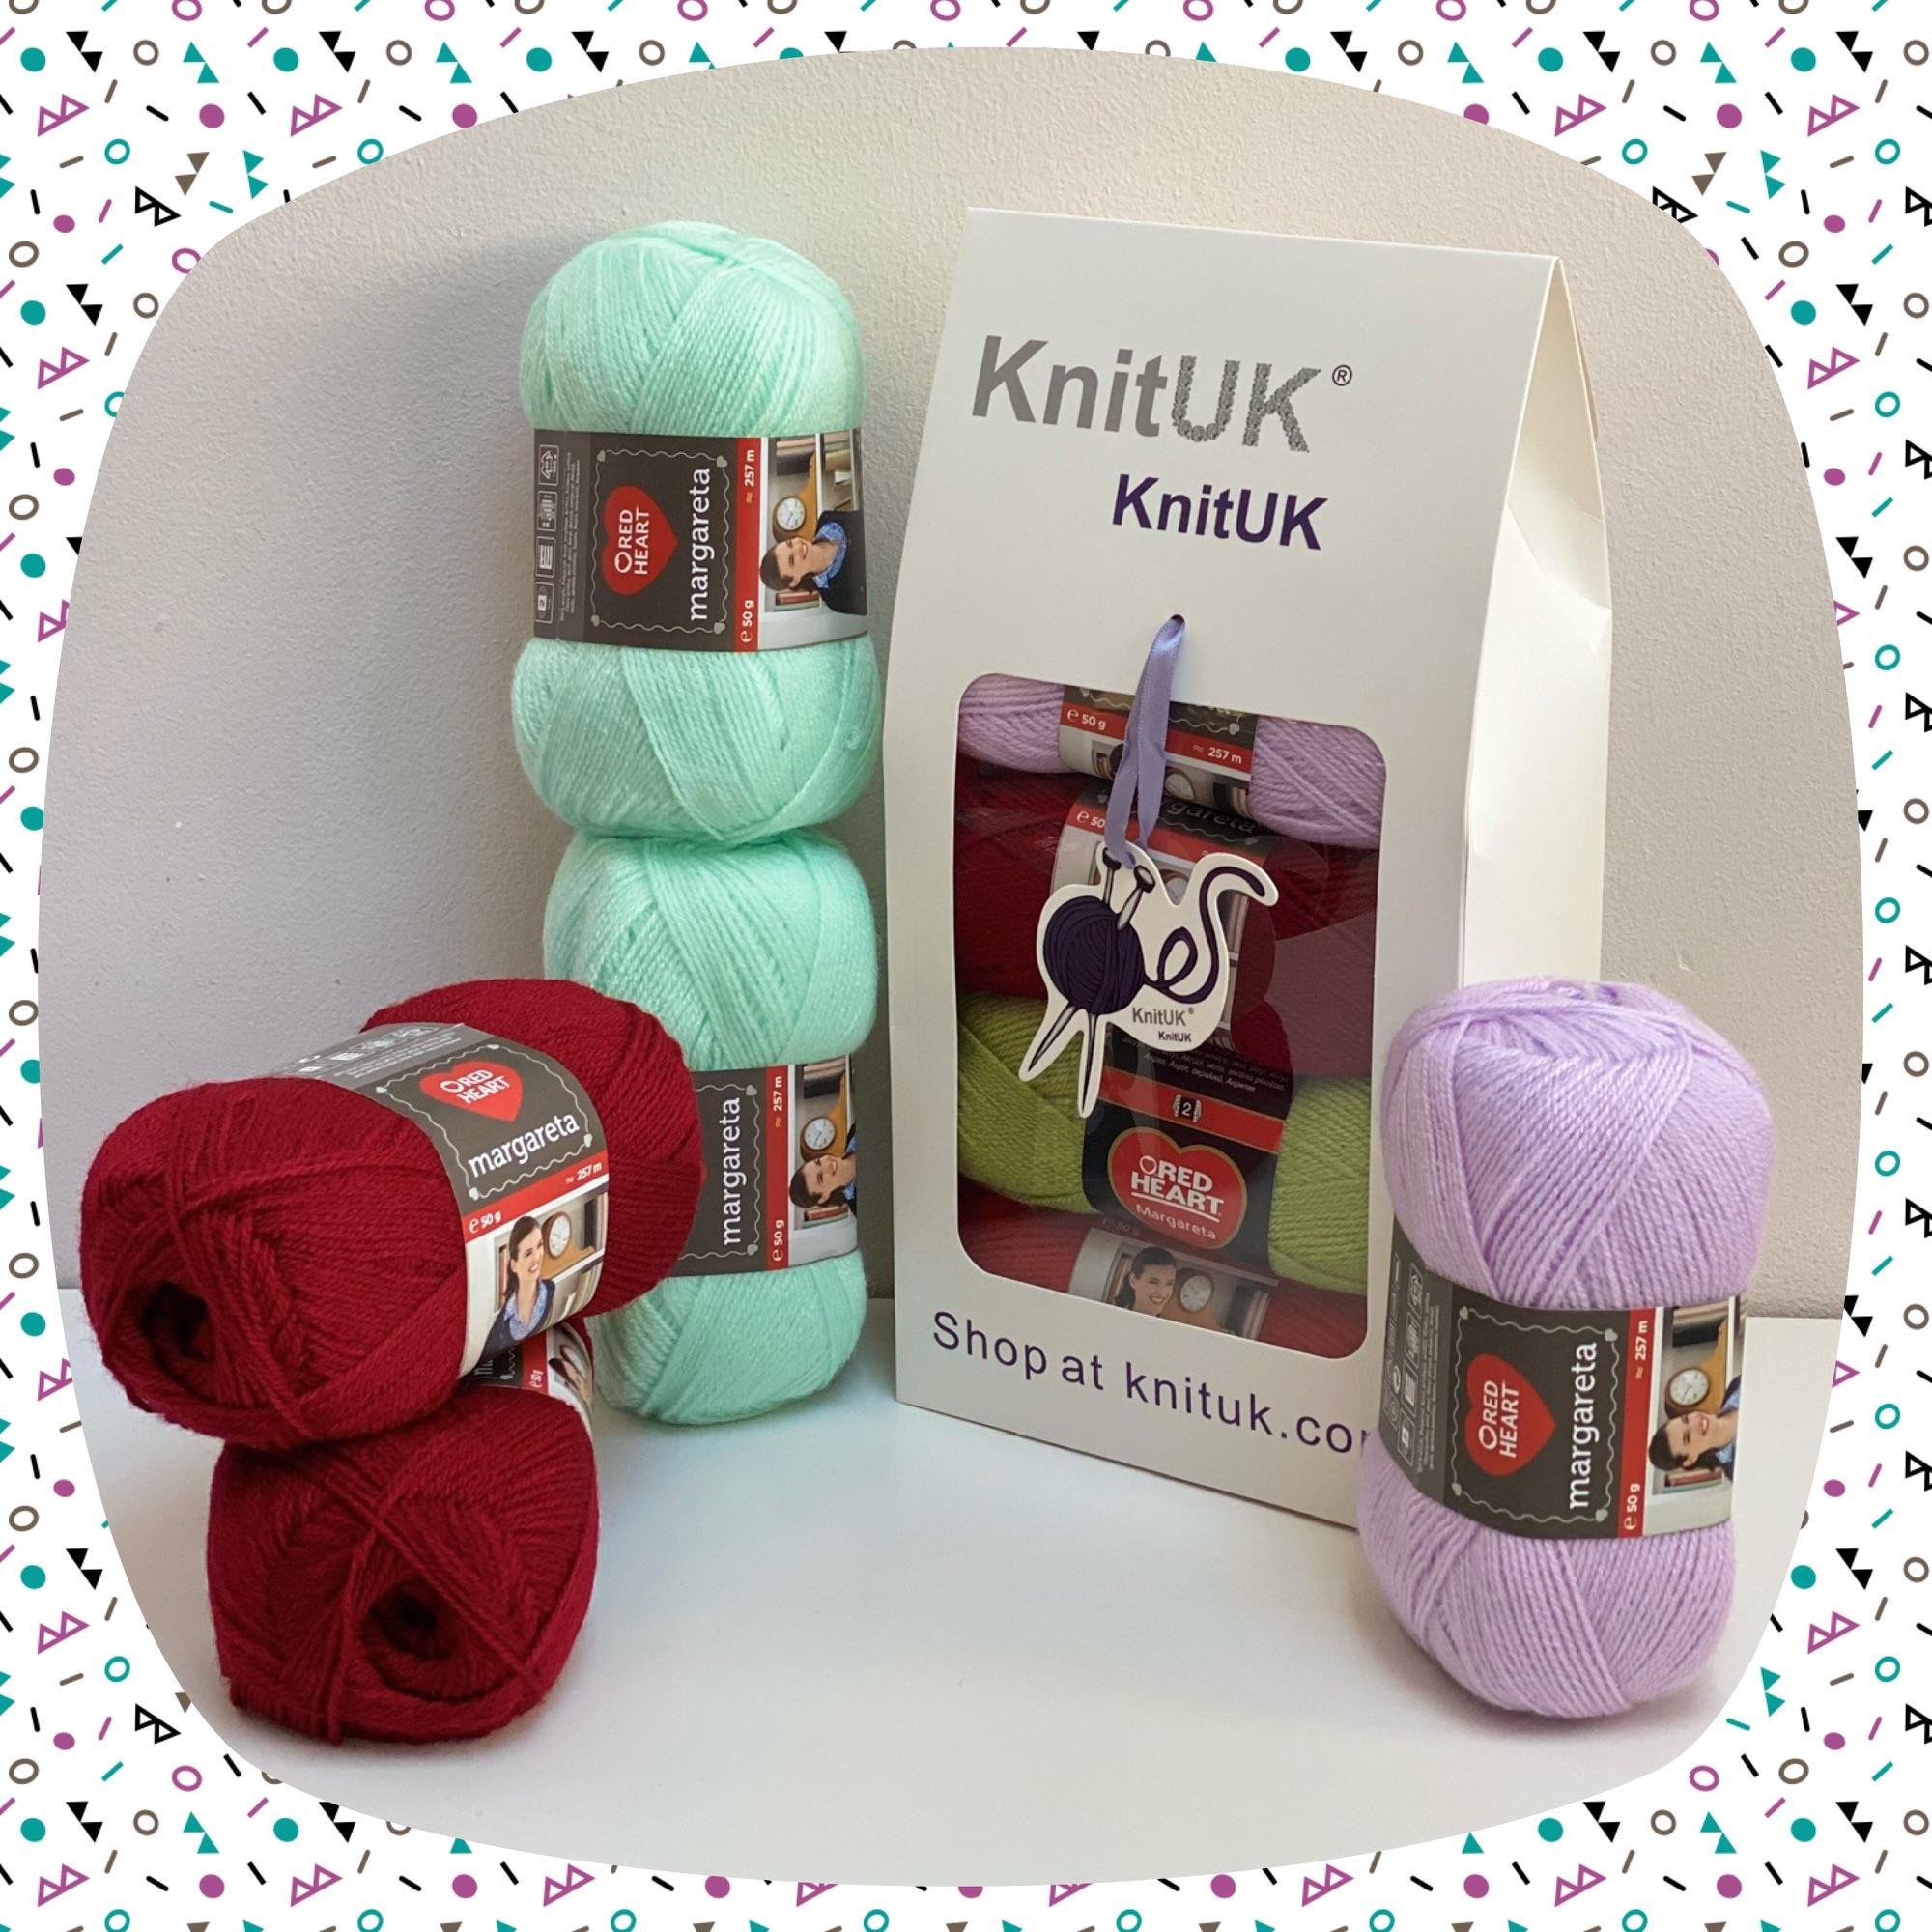 red heart margareta knitting crochet yarn knituk box